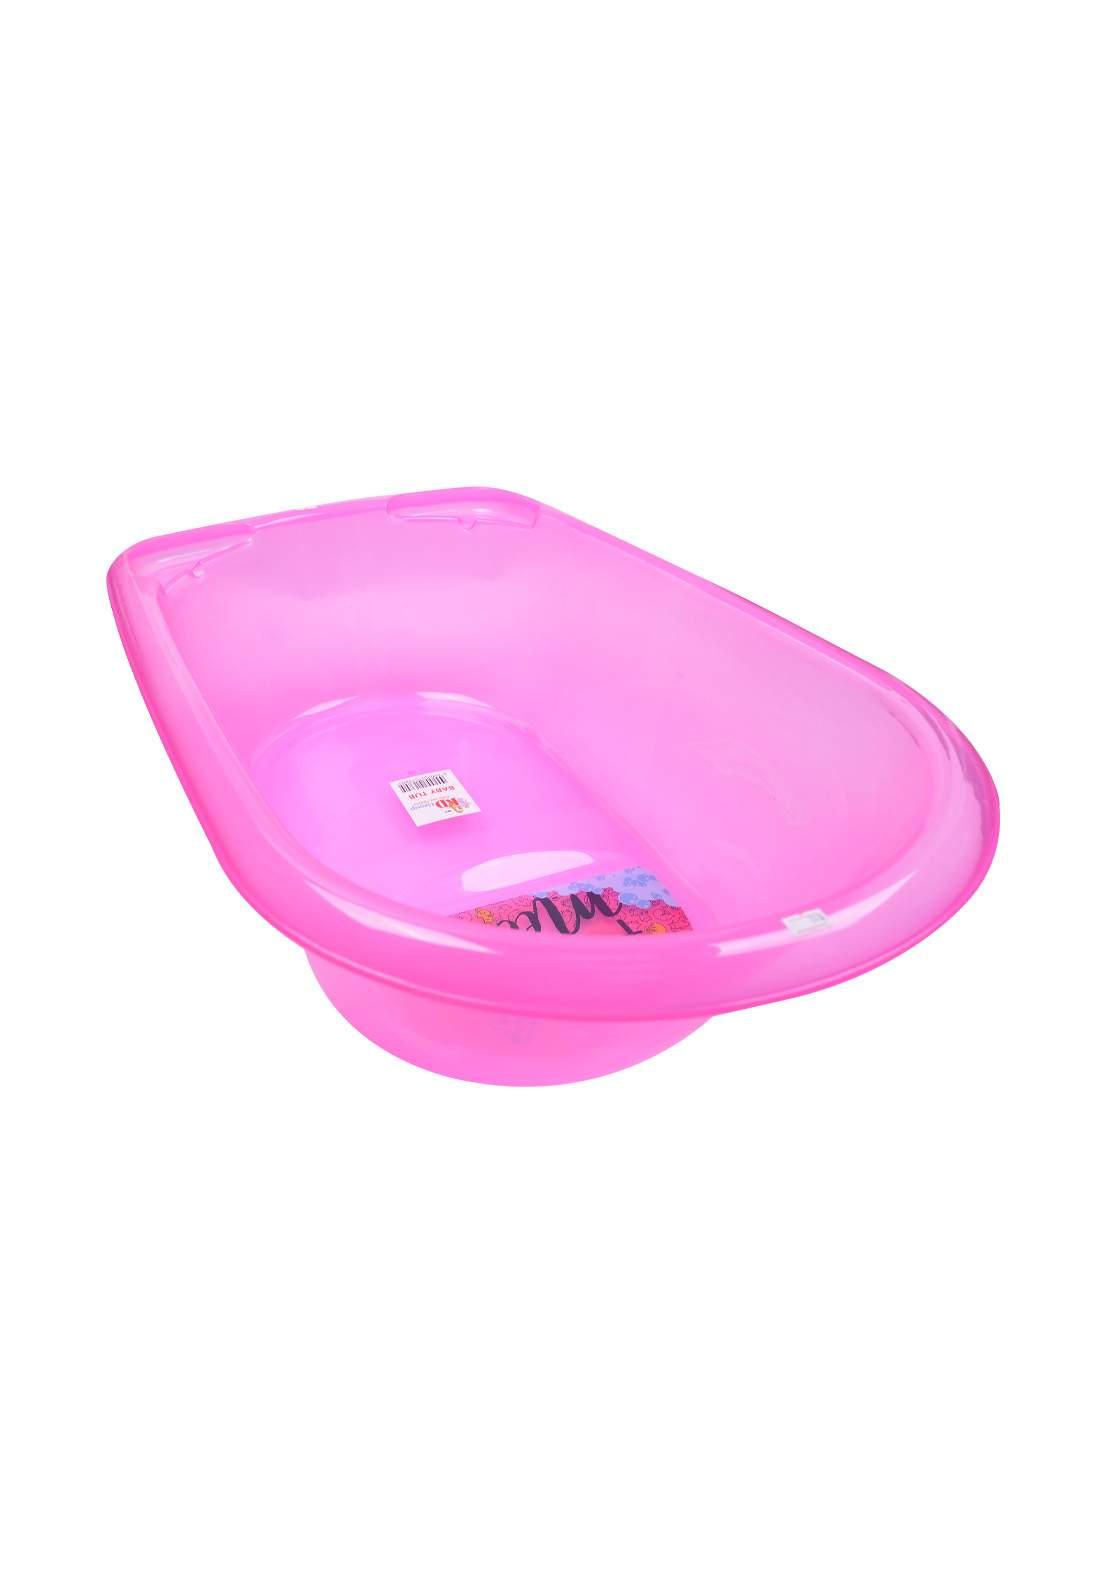 KD Group Baby Tub حوض أستحمام للأطفال